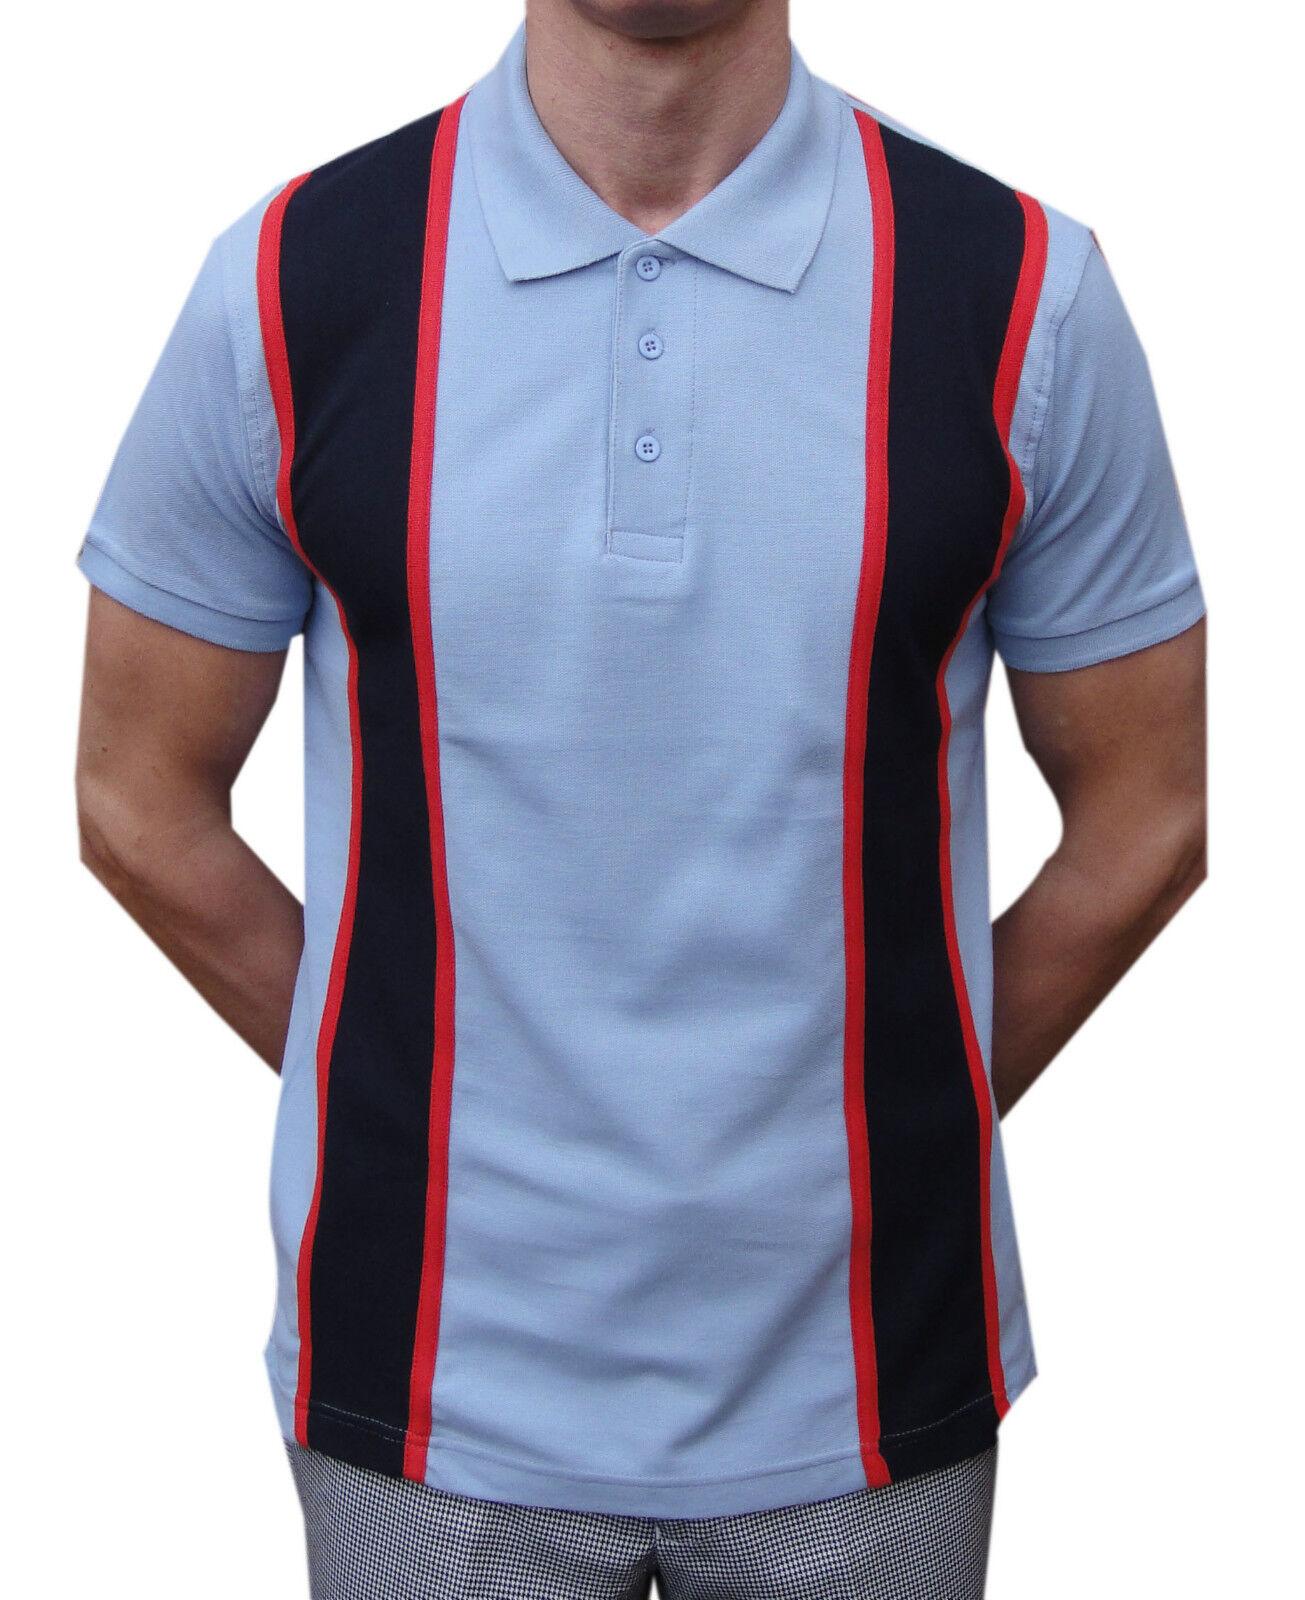 1b52b6da SKY POLO SHIRT RELCO SKINHEAD SCOOTERIST RETRO SKA MOD CLOTHING STRIPED  blueE nzfrnw2417-Casual Shirts & Tops